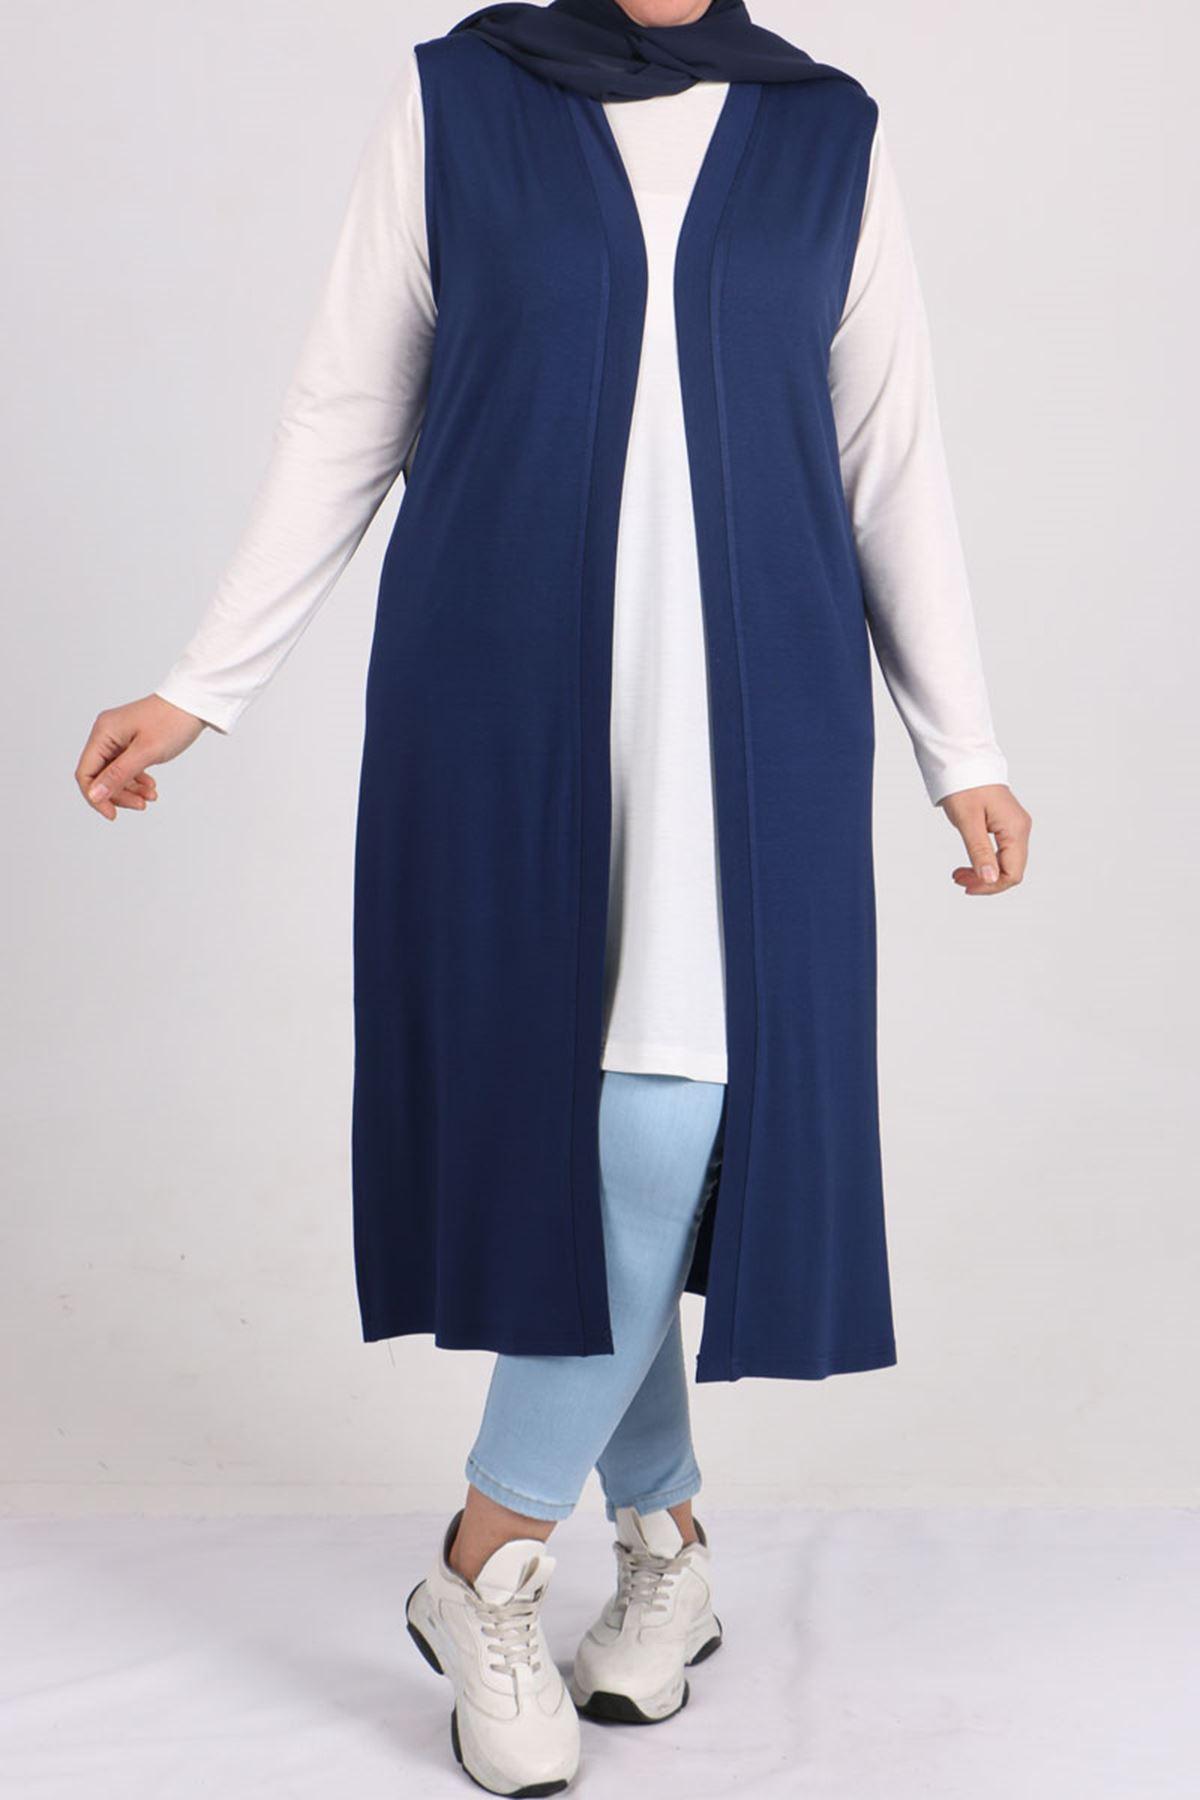 4007 Plus Size (Wear & Go) Vest - Indigo